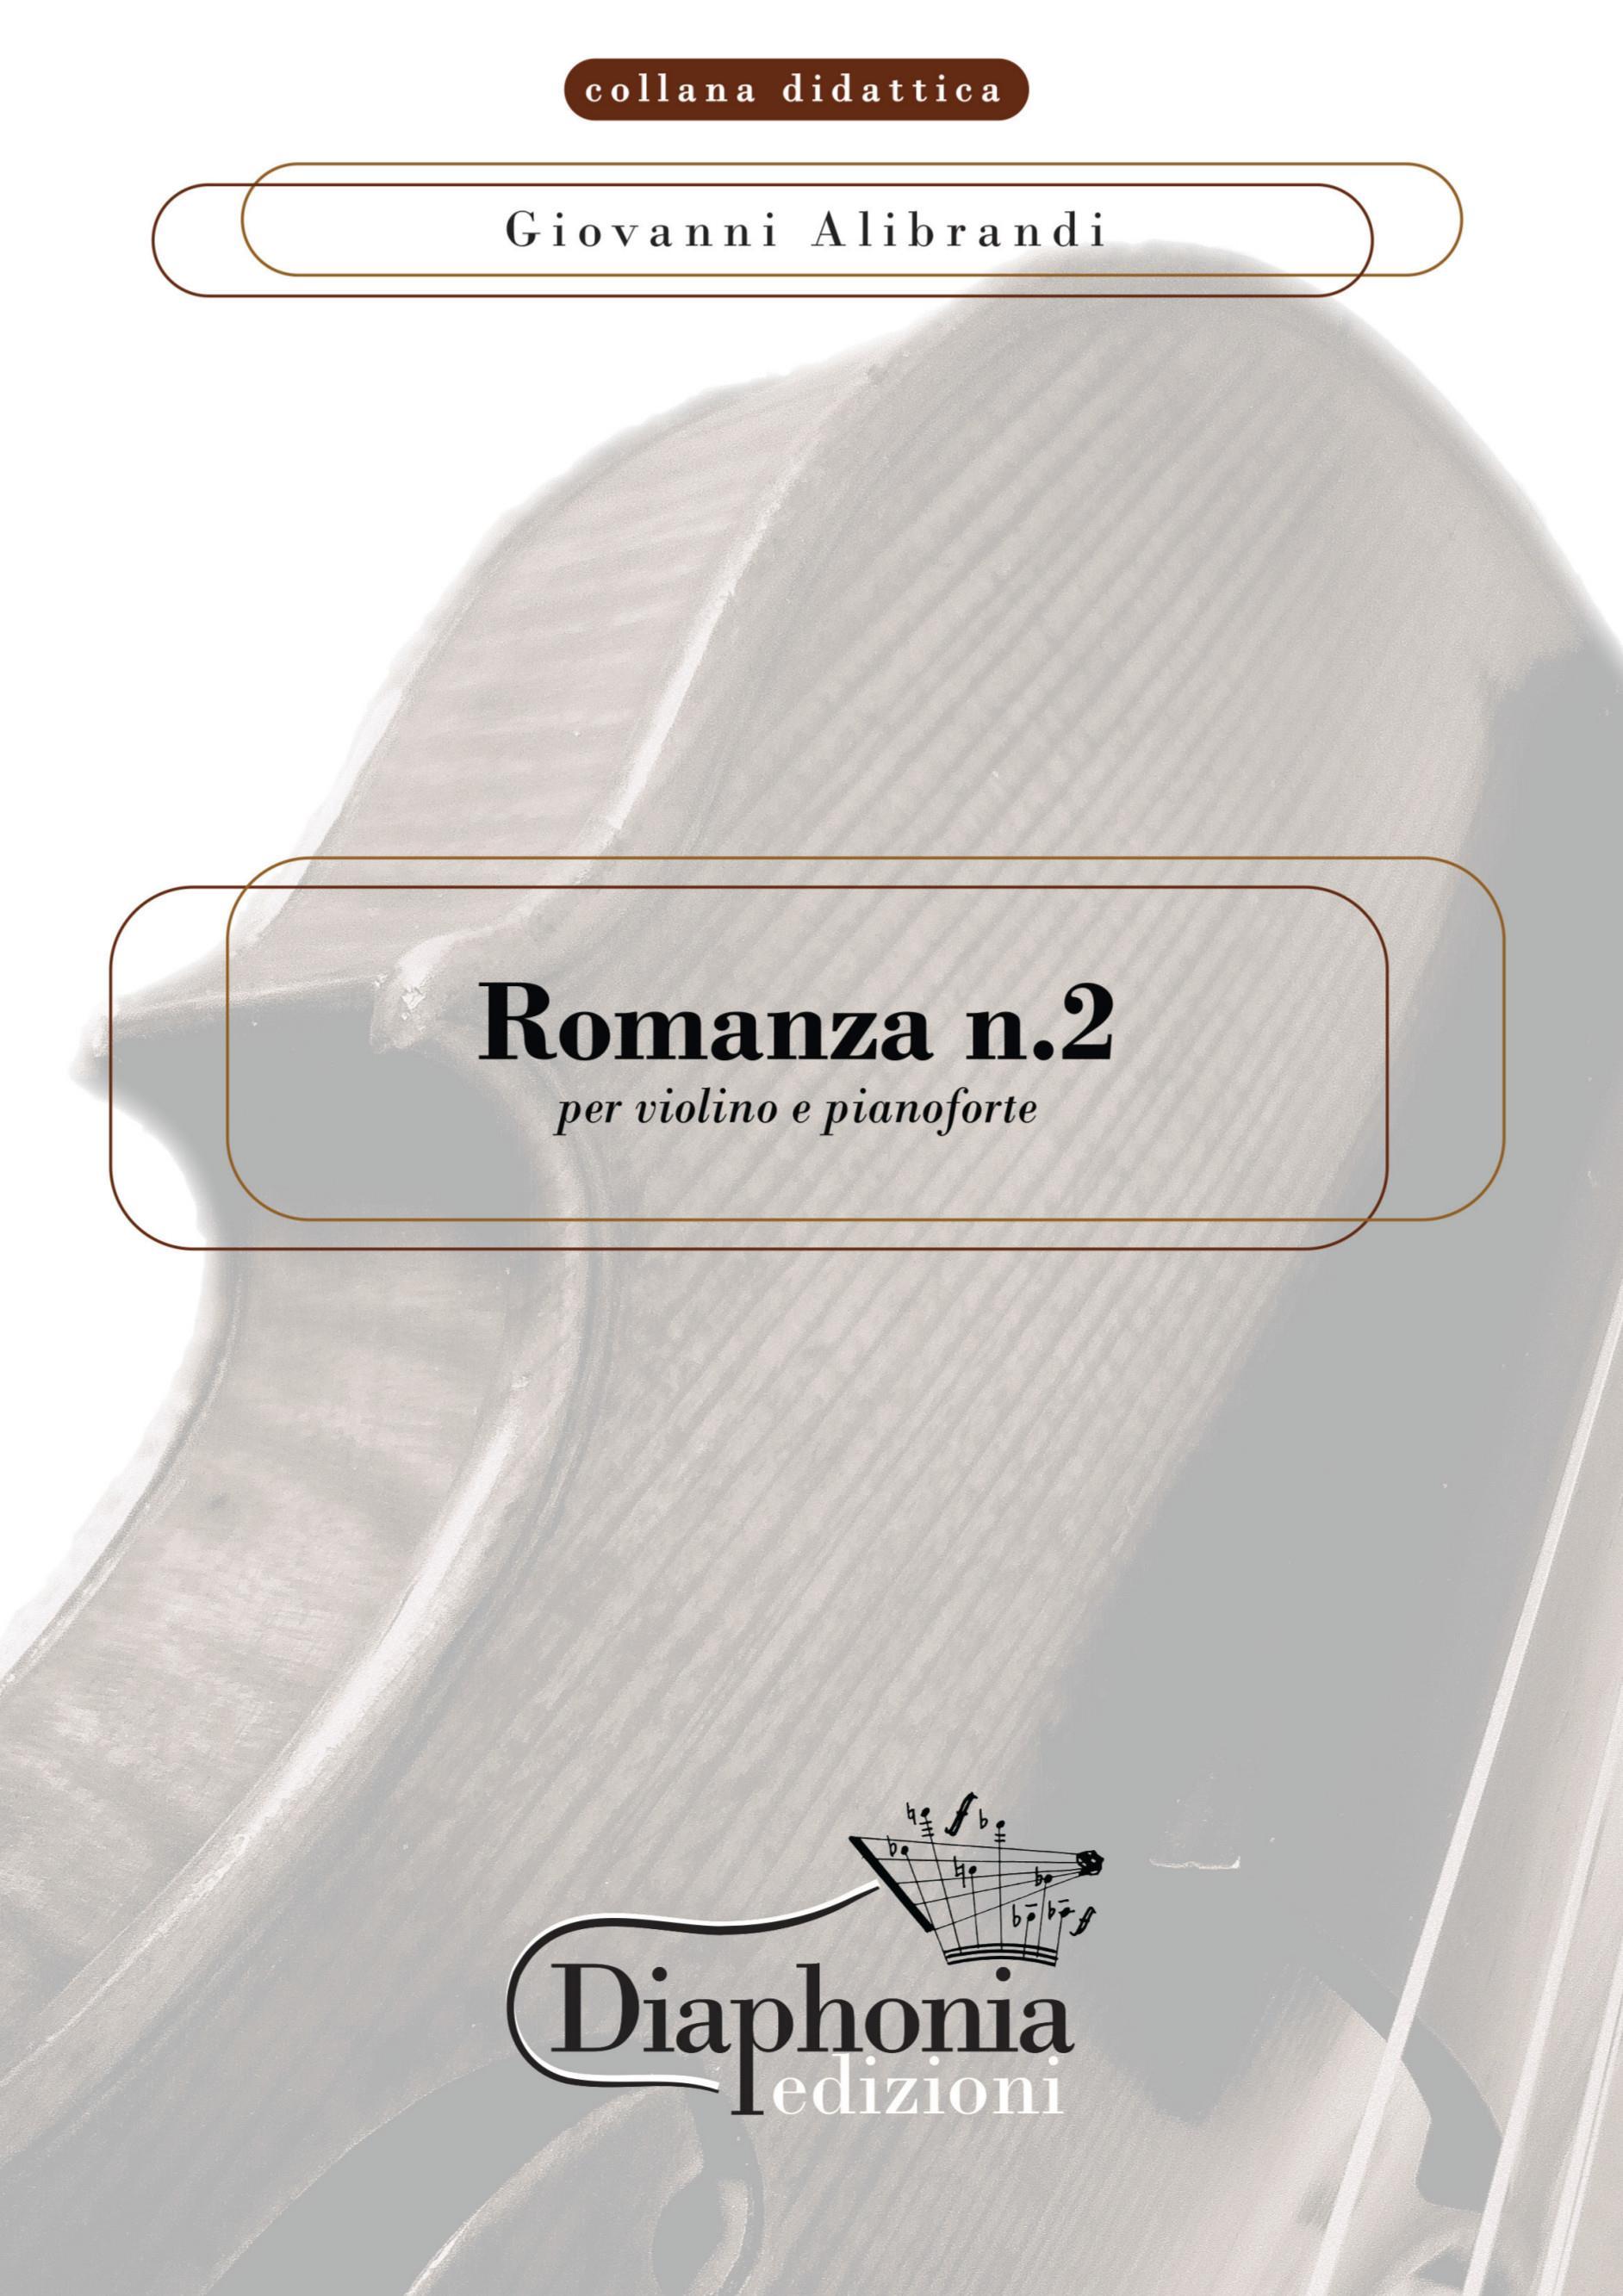 Romanza n. 2